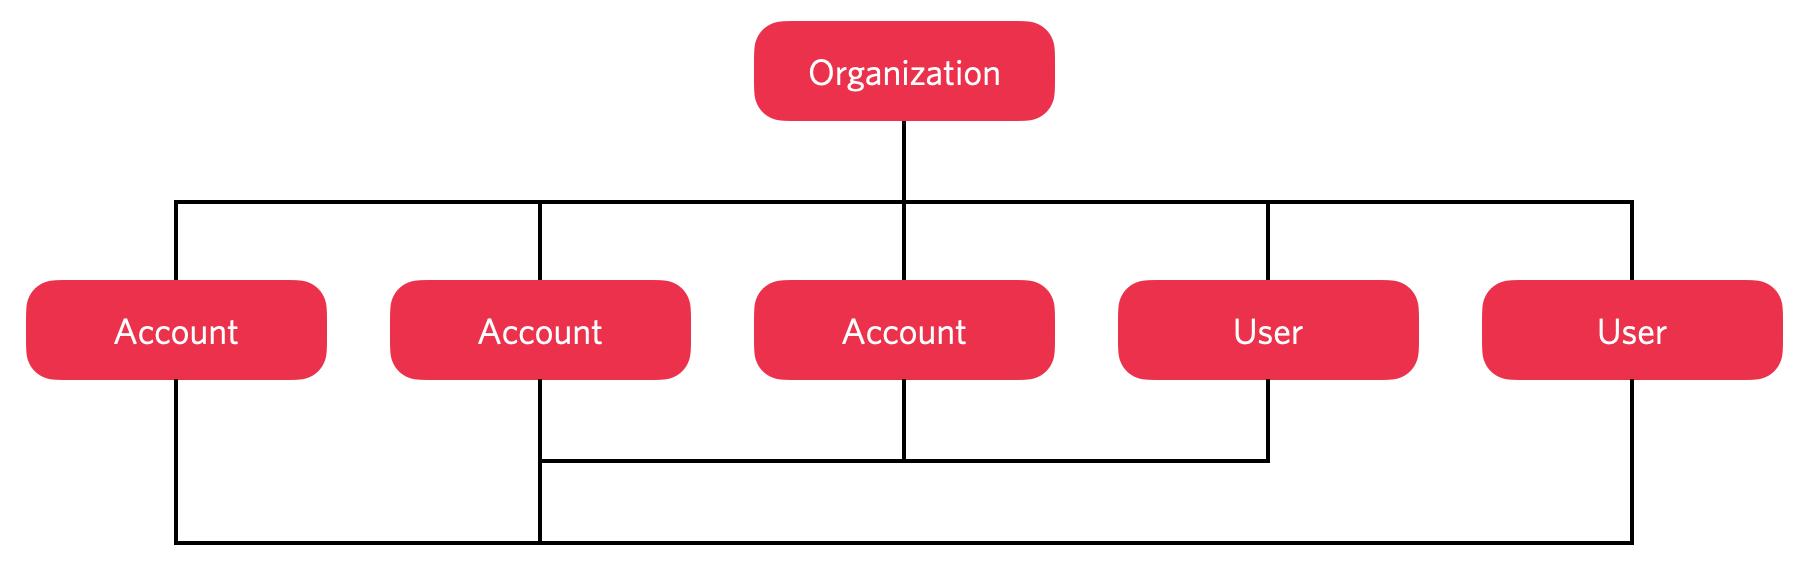 The Twilio Organizations architecture